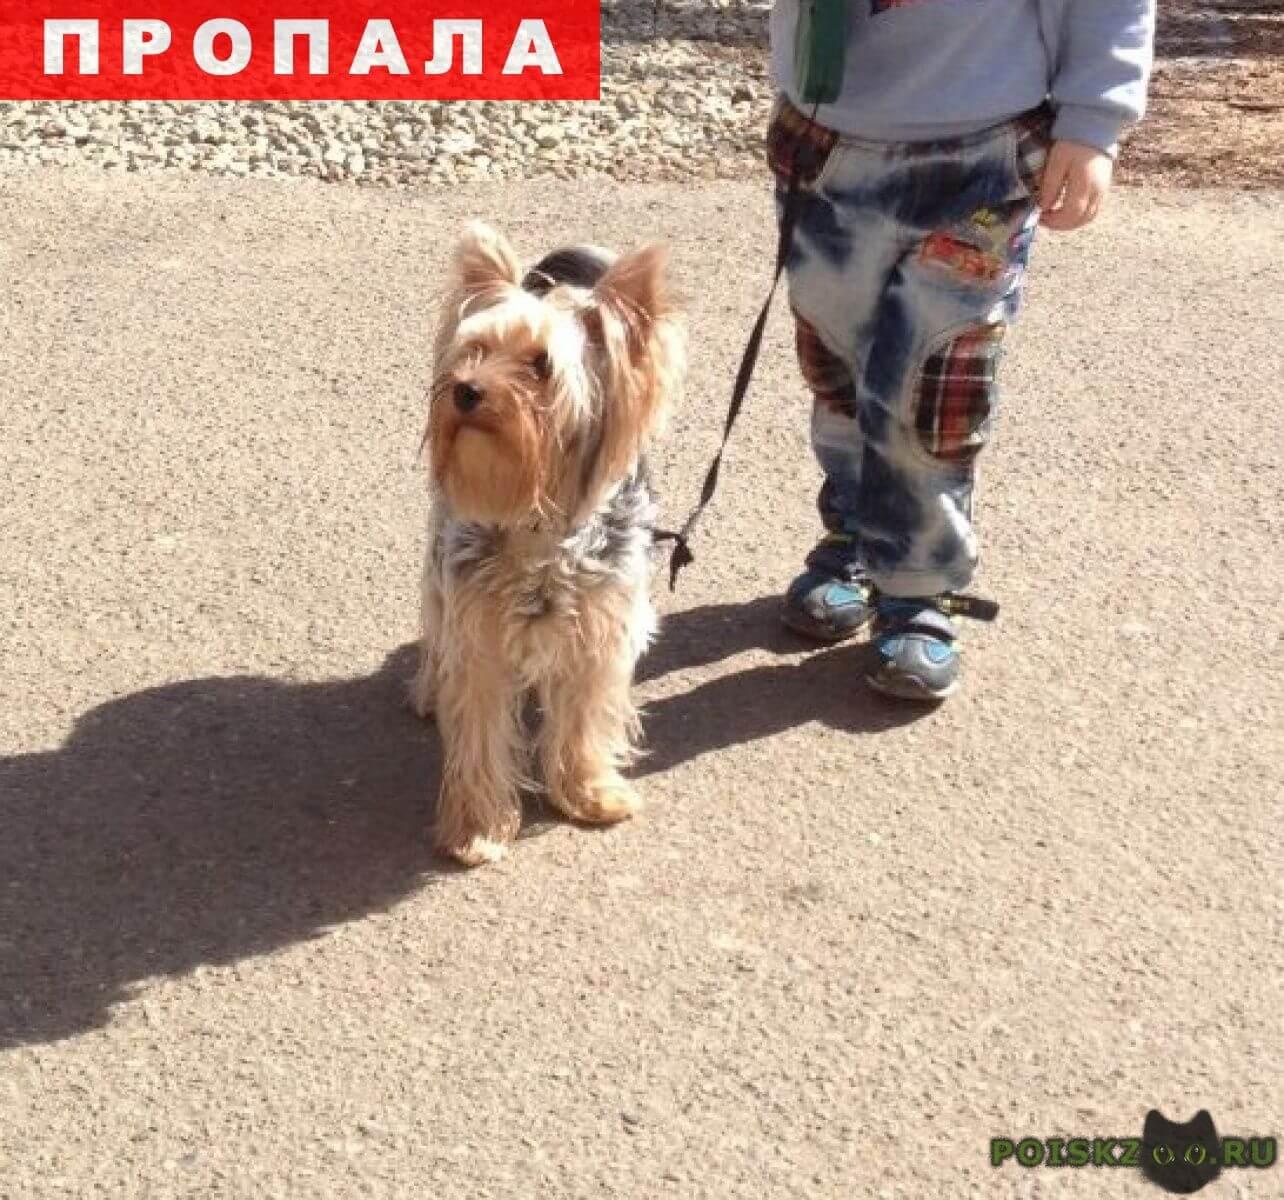 Пропала собака кобель йорк серебристый г.Краснодар